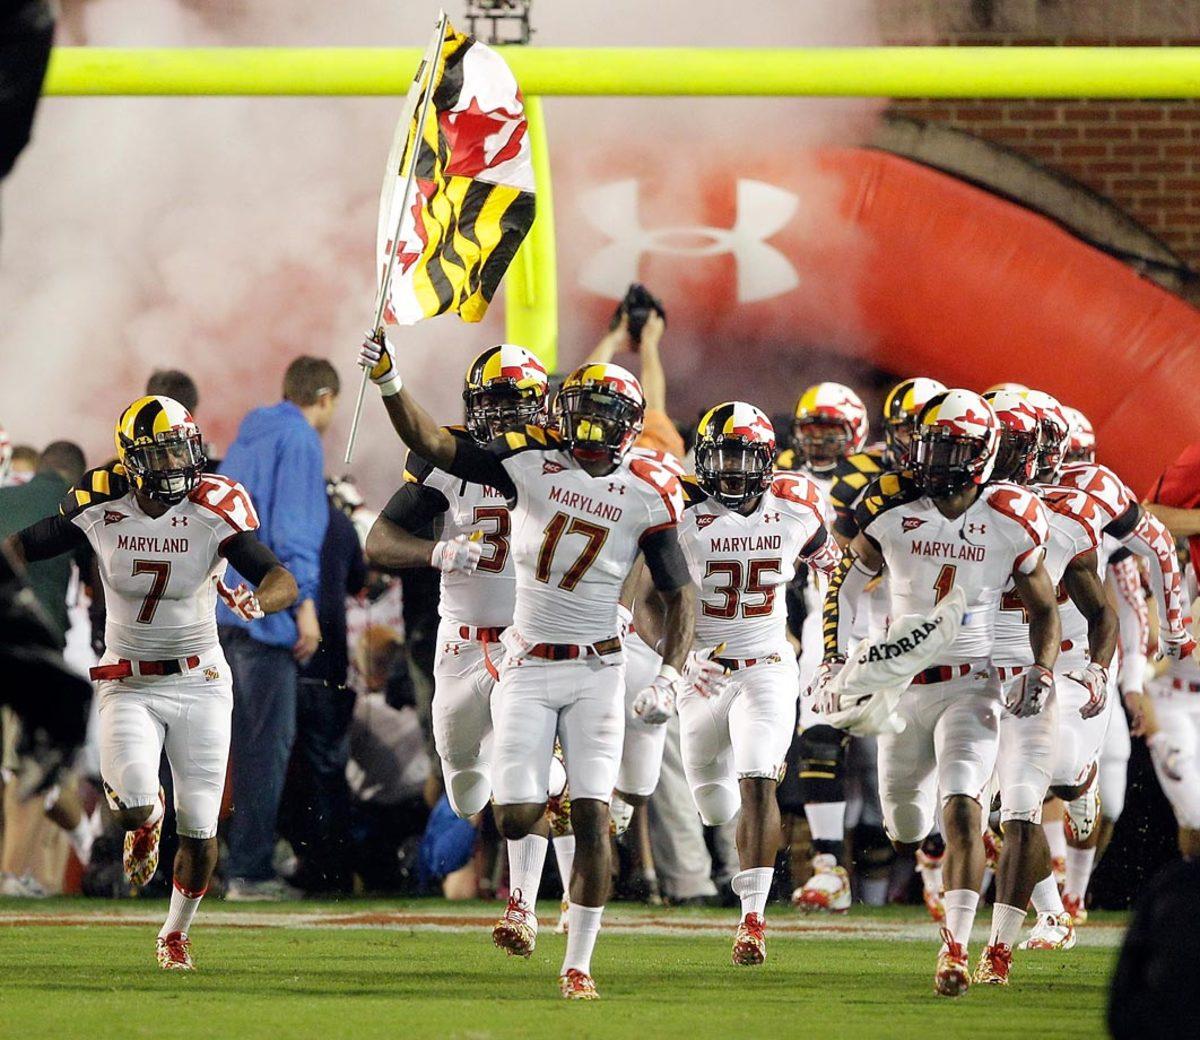 Maryland-Terrapins-uniforms-2011.jpg